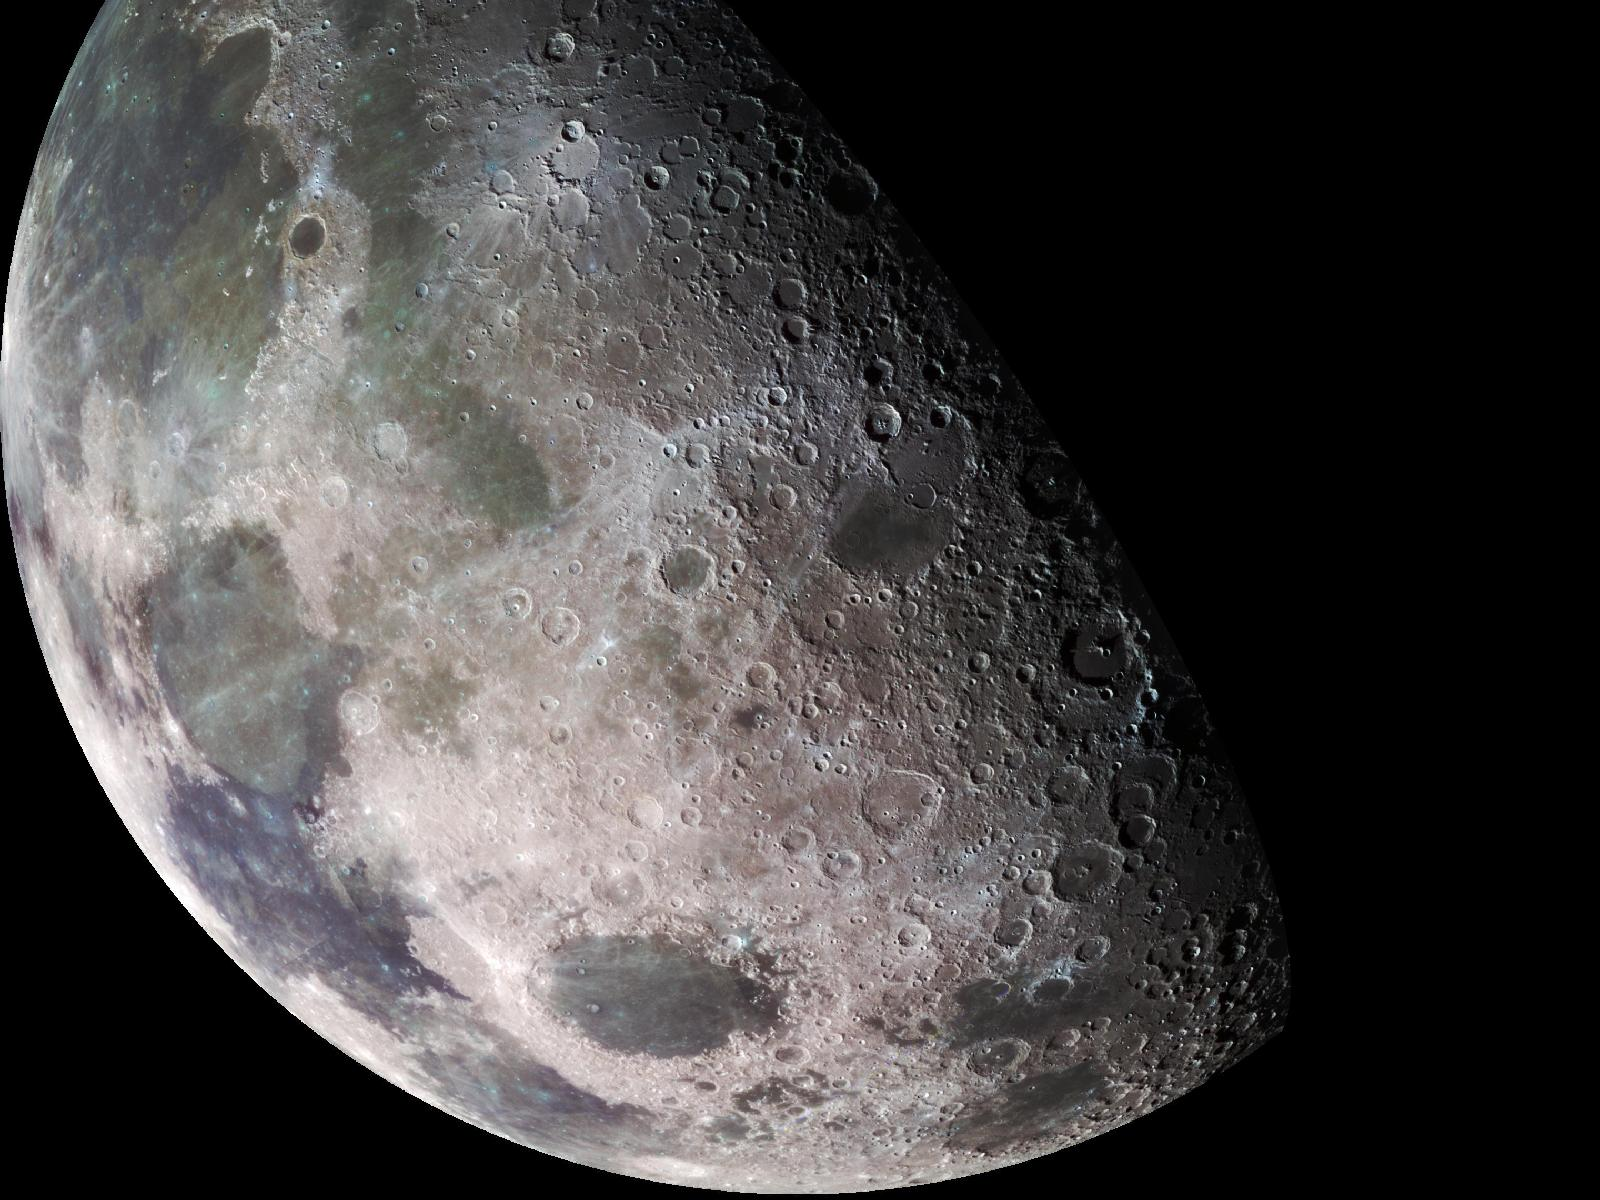 moon shots of earth and mars - photo #40